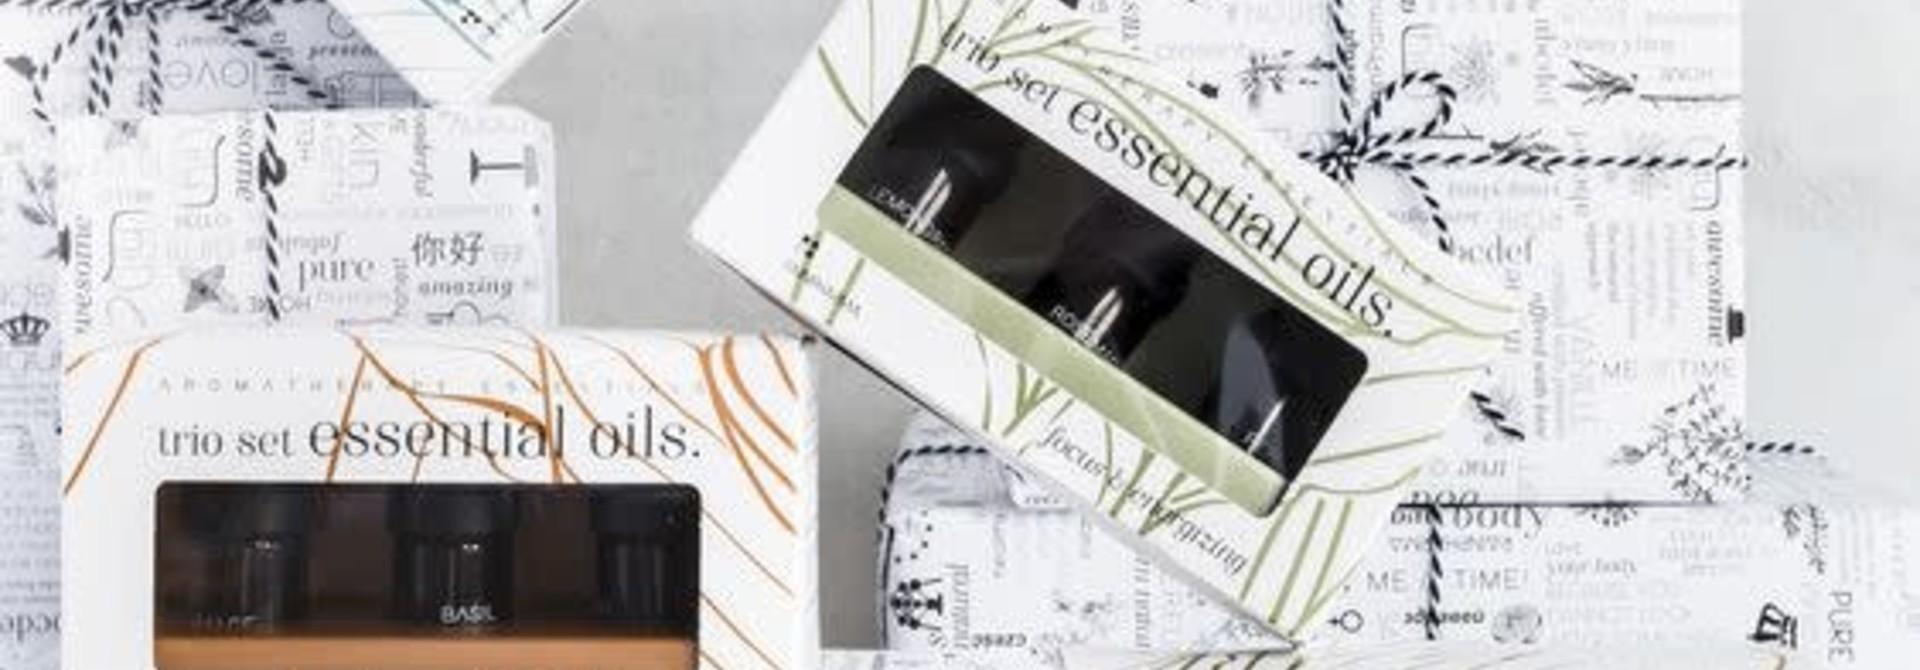 Trio Set Essential Oils |FRESH & FRUITY | Essentiële Olie